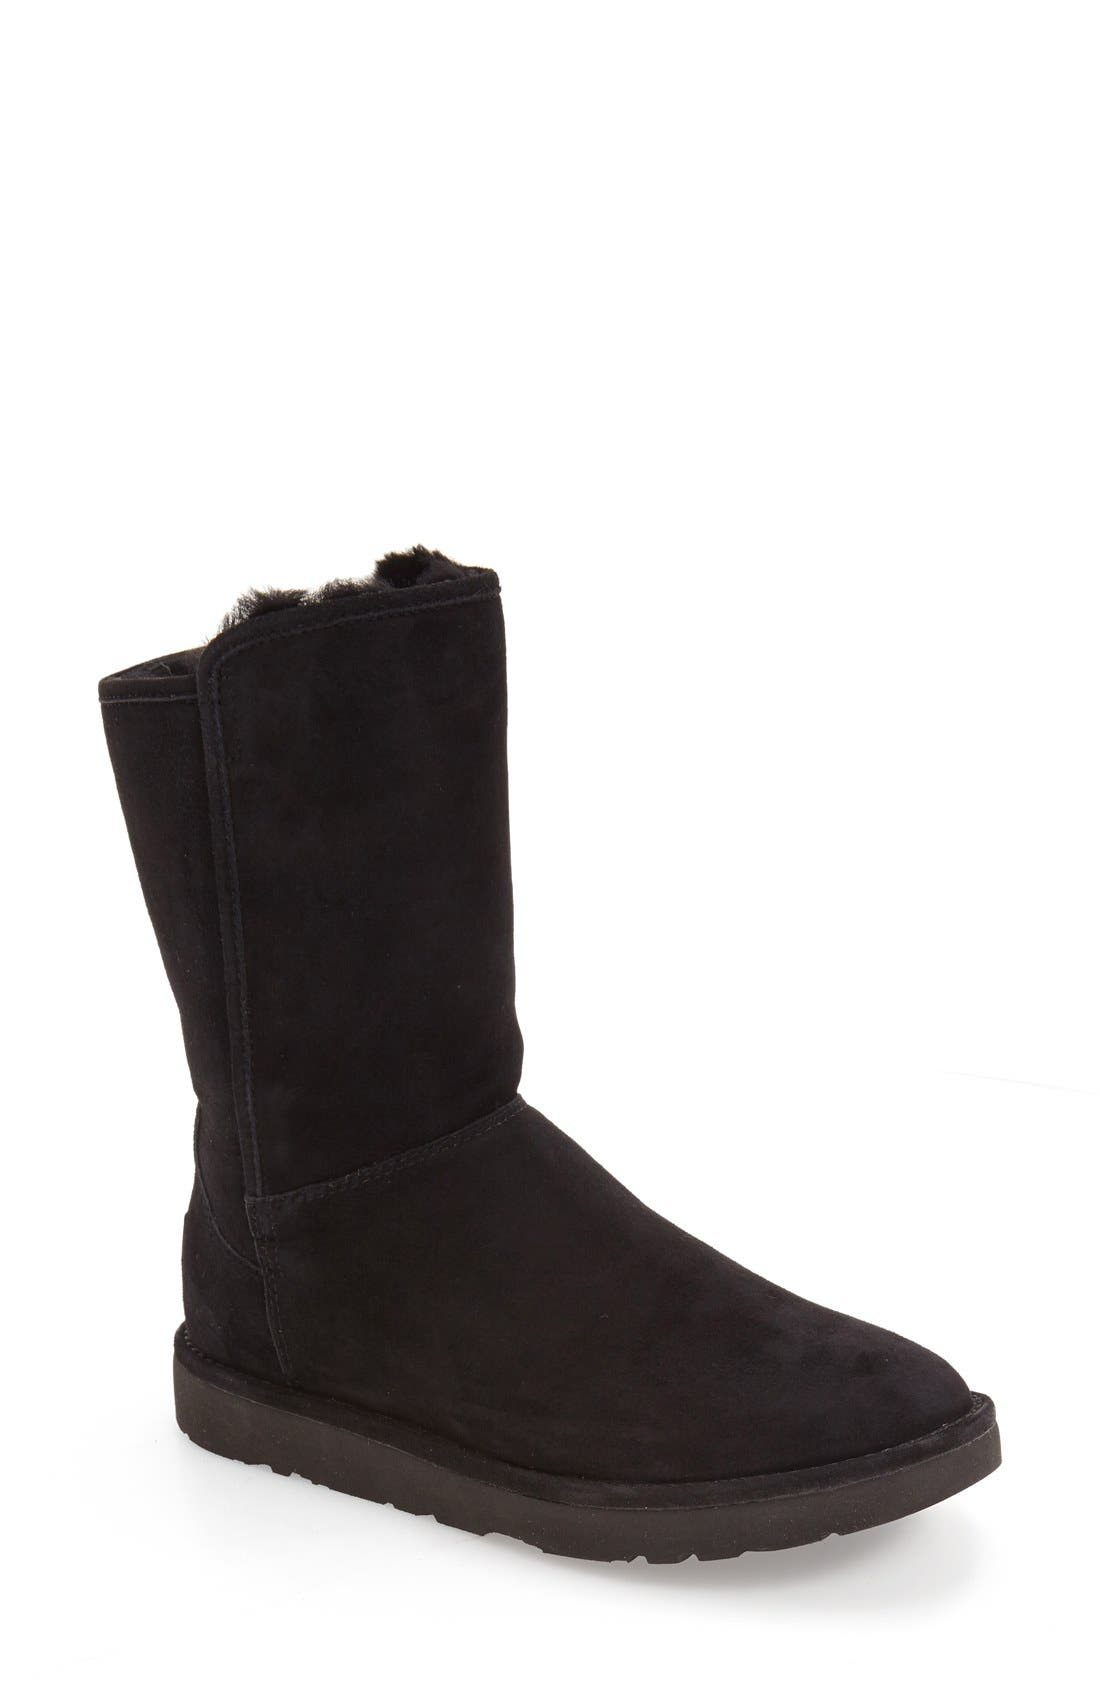 Main Image - UGG® Abree II Short Boot (Women)